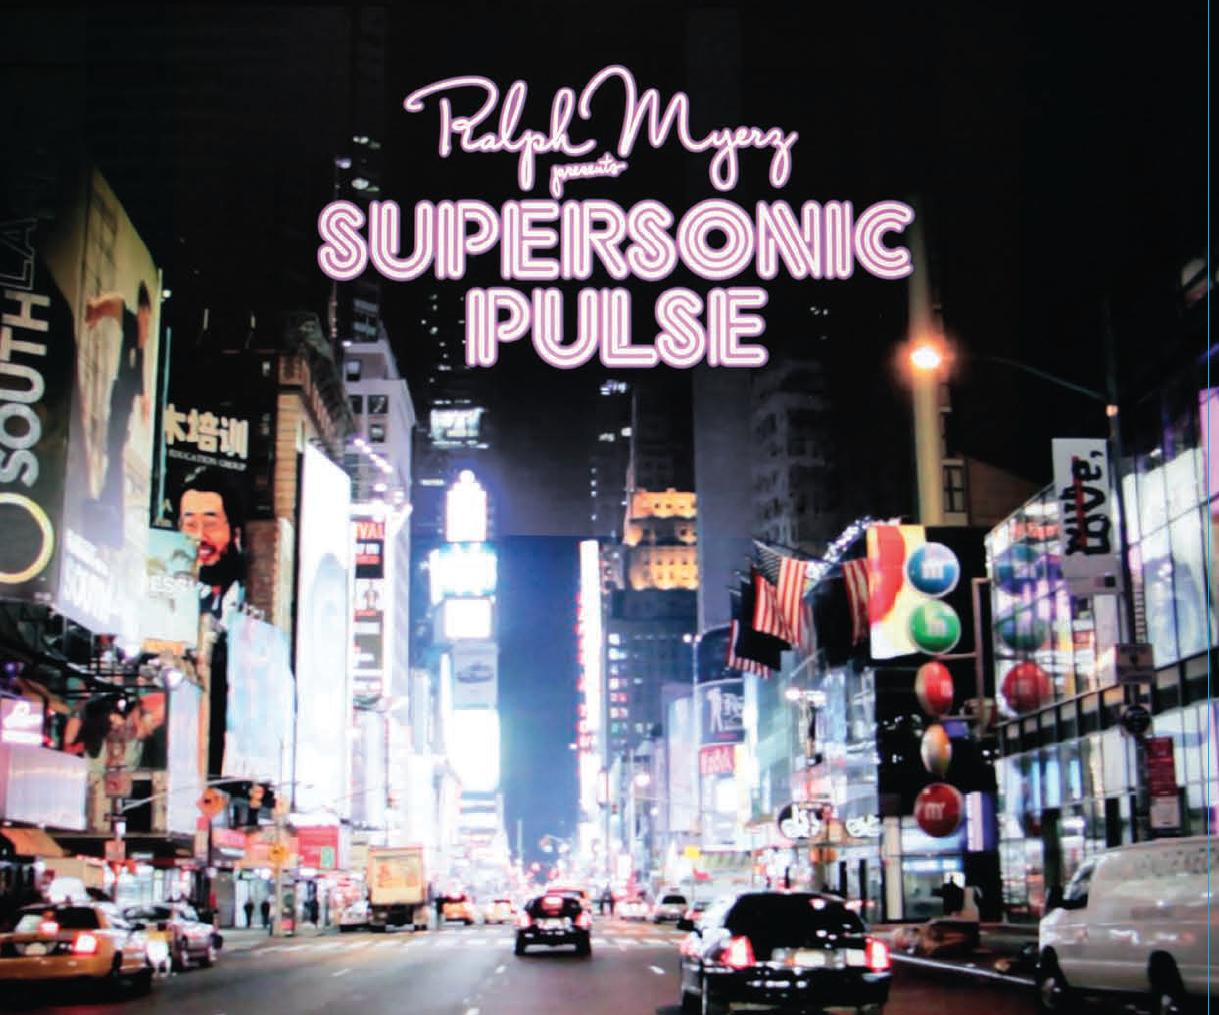 Ralph Myerz/SUPERSONIC PULSE LP + CD